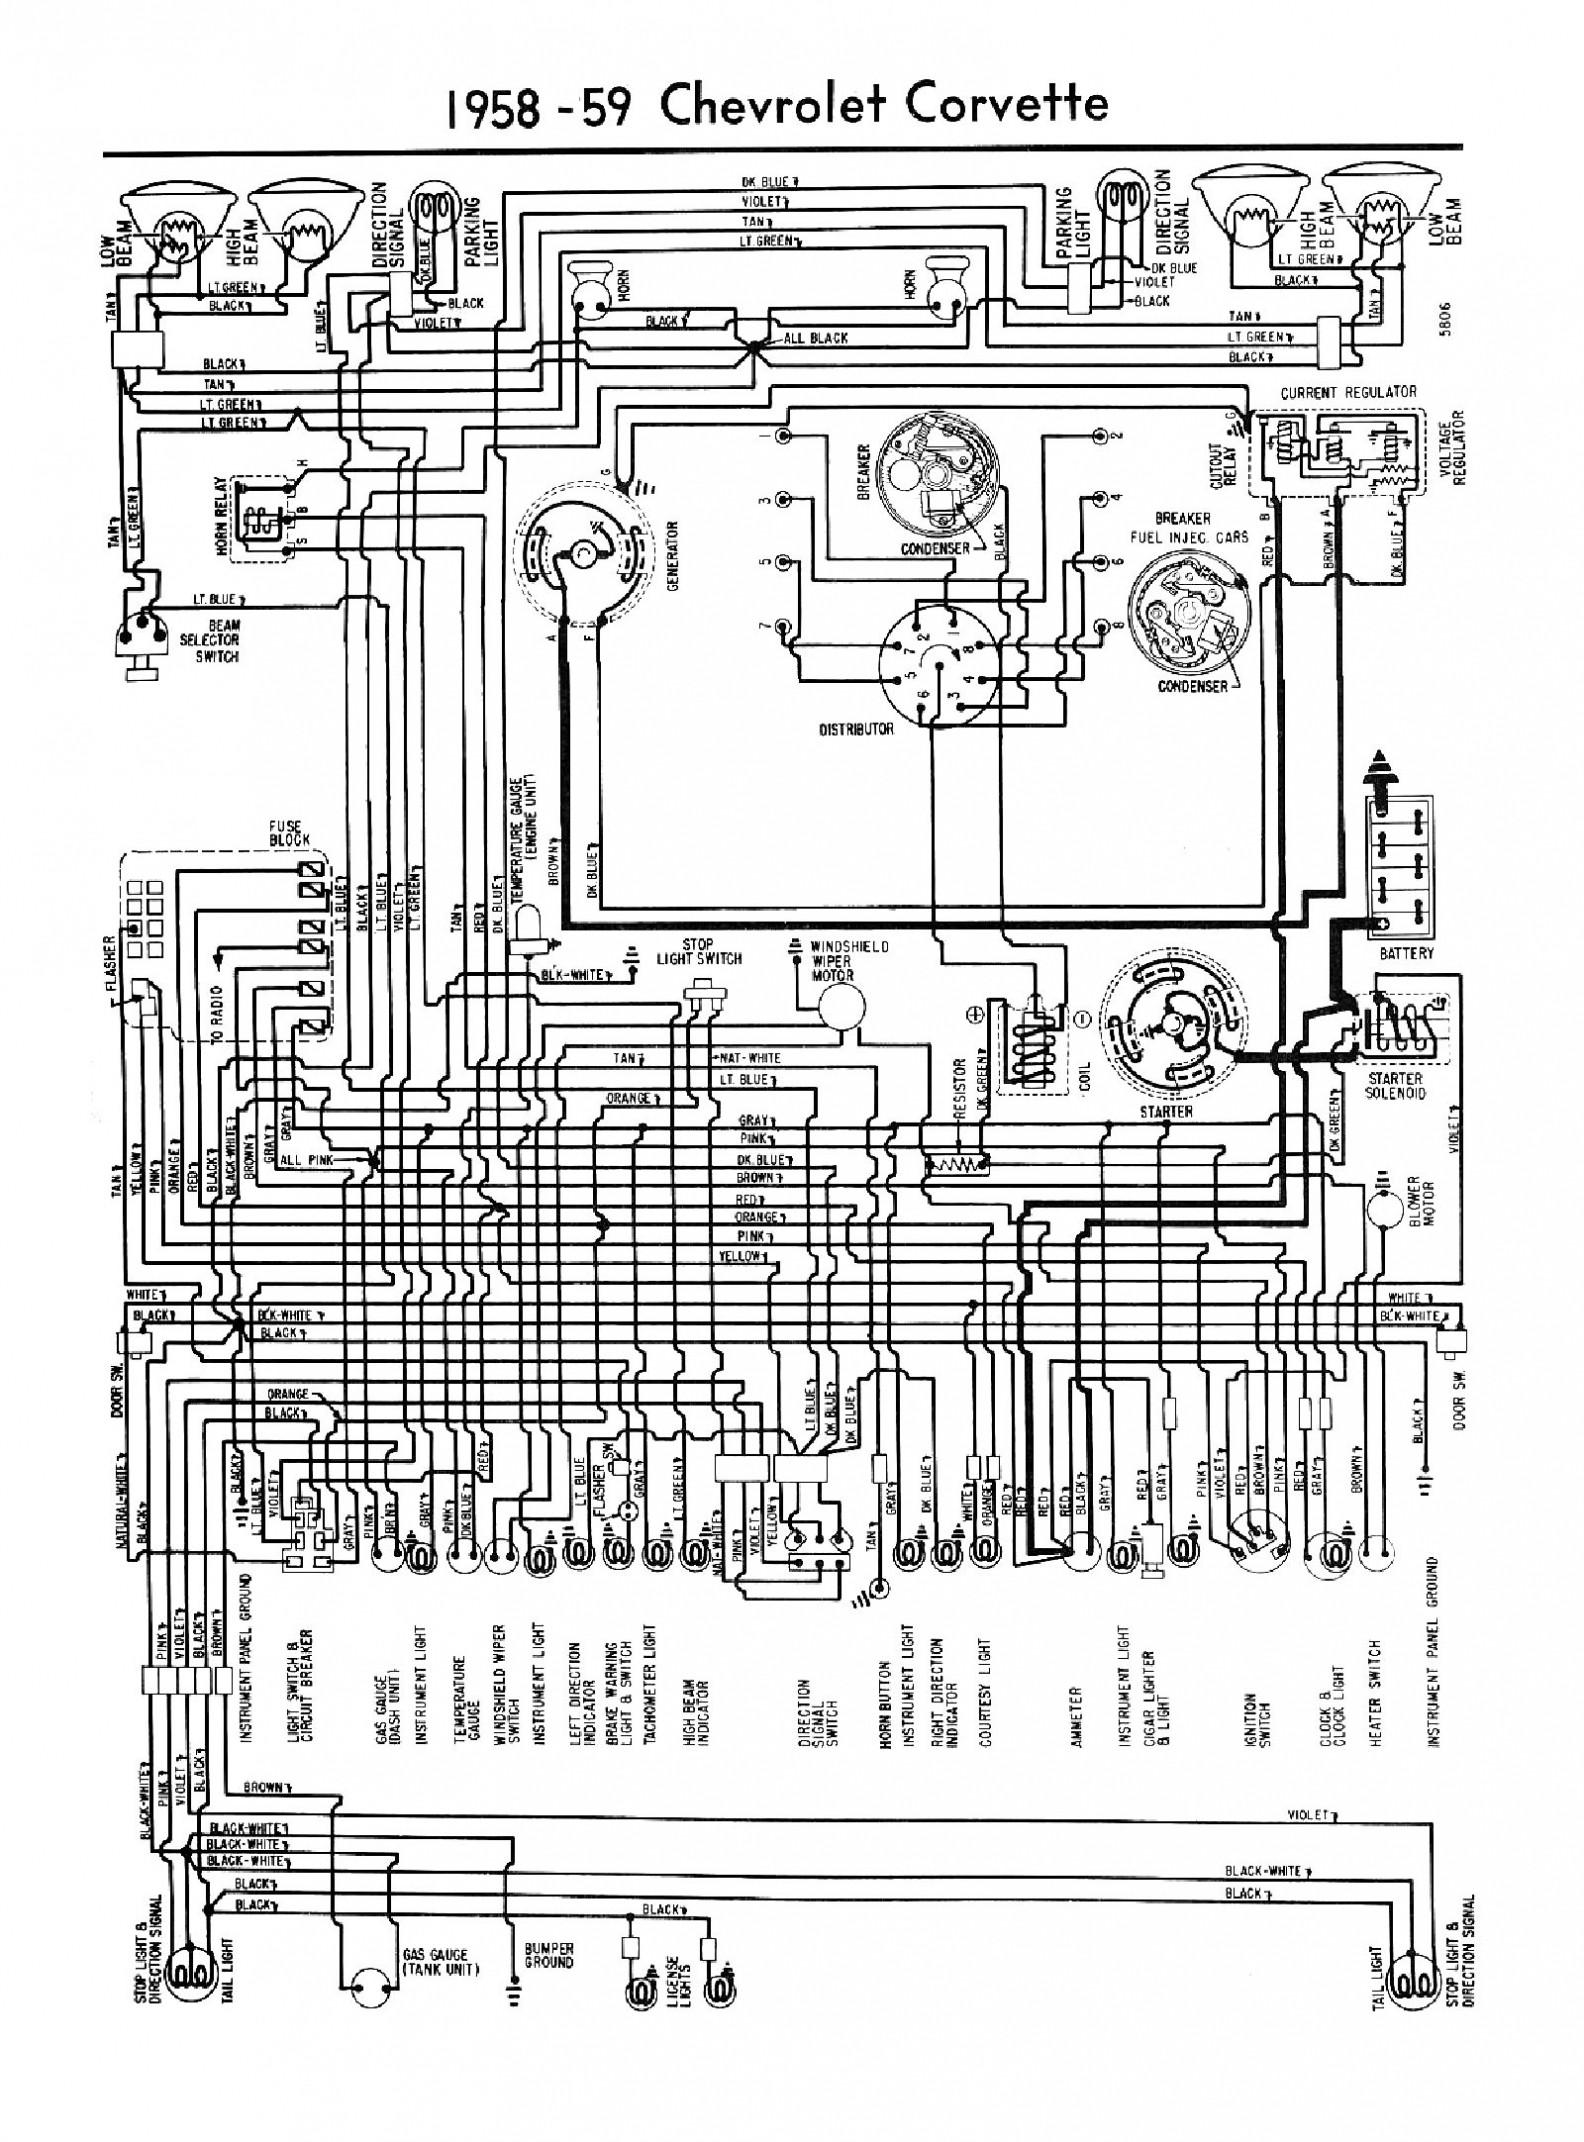 1993 Chevy S10 Wiring Diagram S10 Wiring Diagram Pdf — Daytonva150 Of 1993 Chevy S10 Wiring Diagram